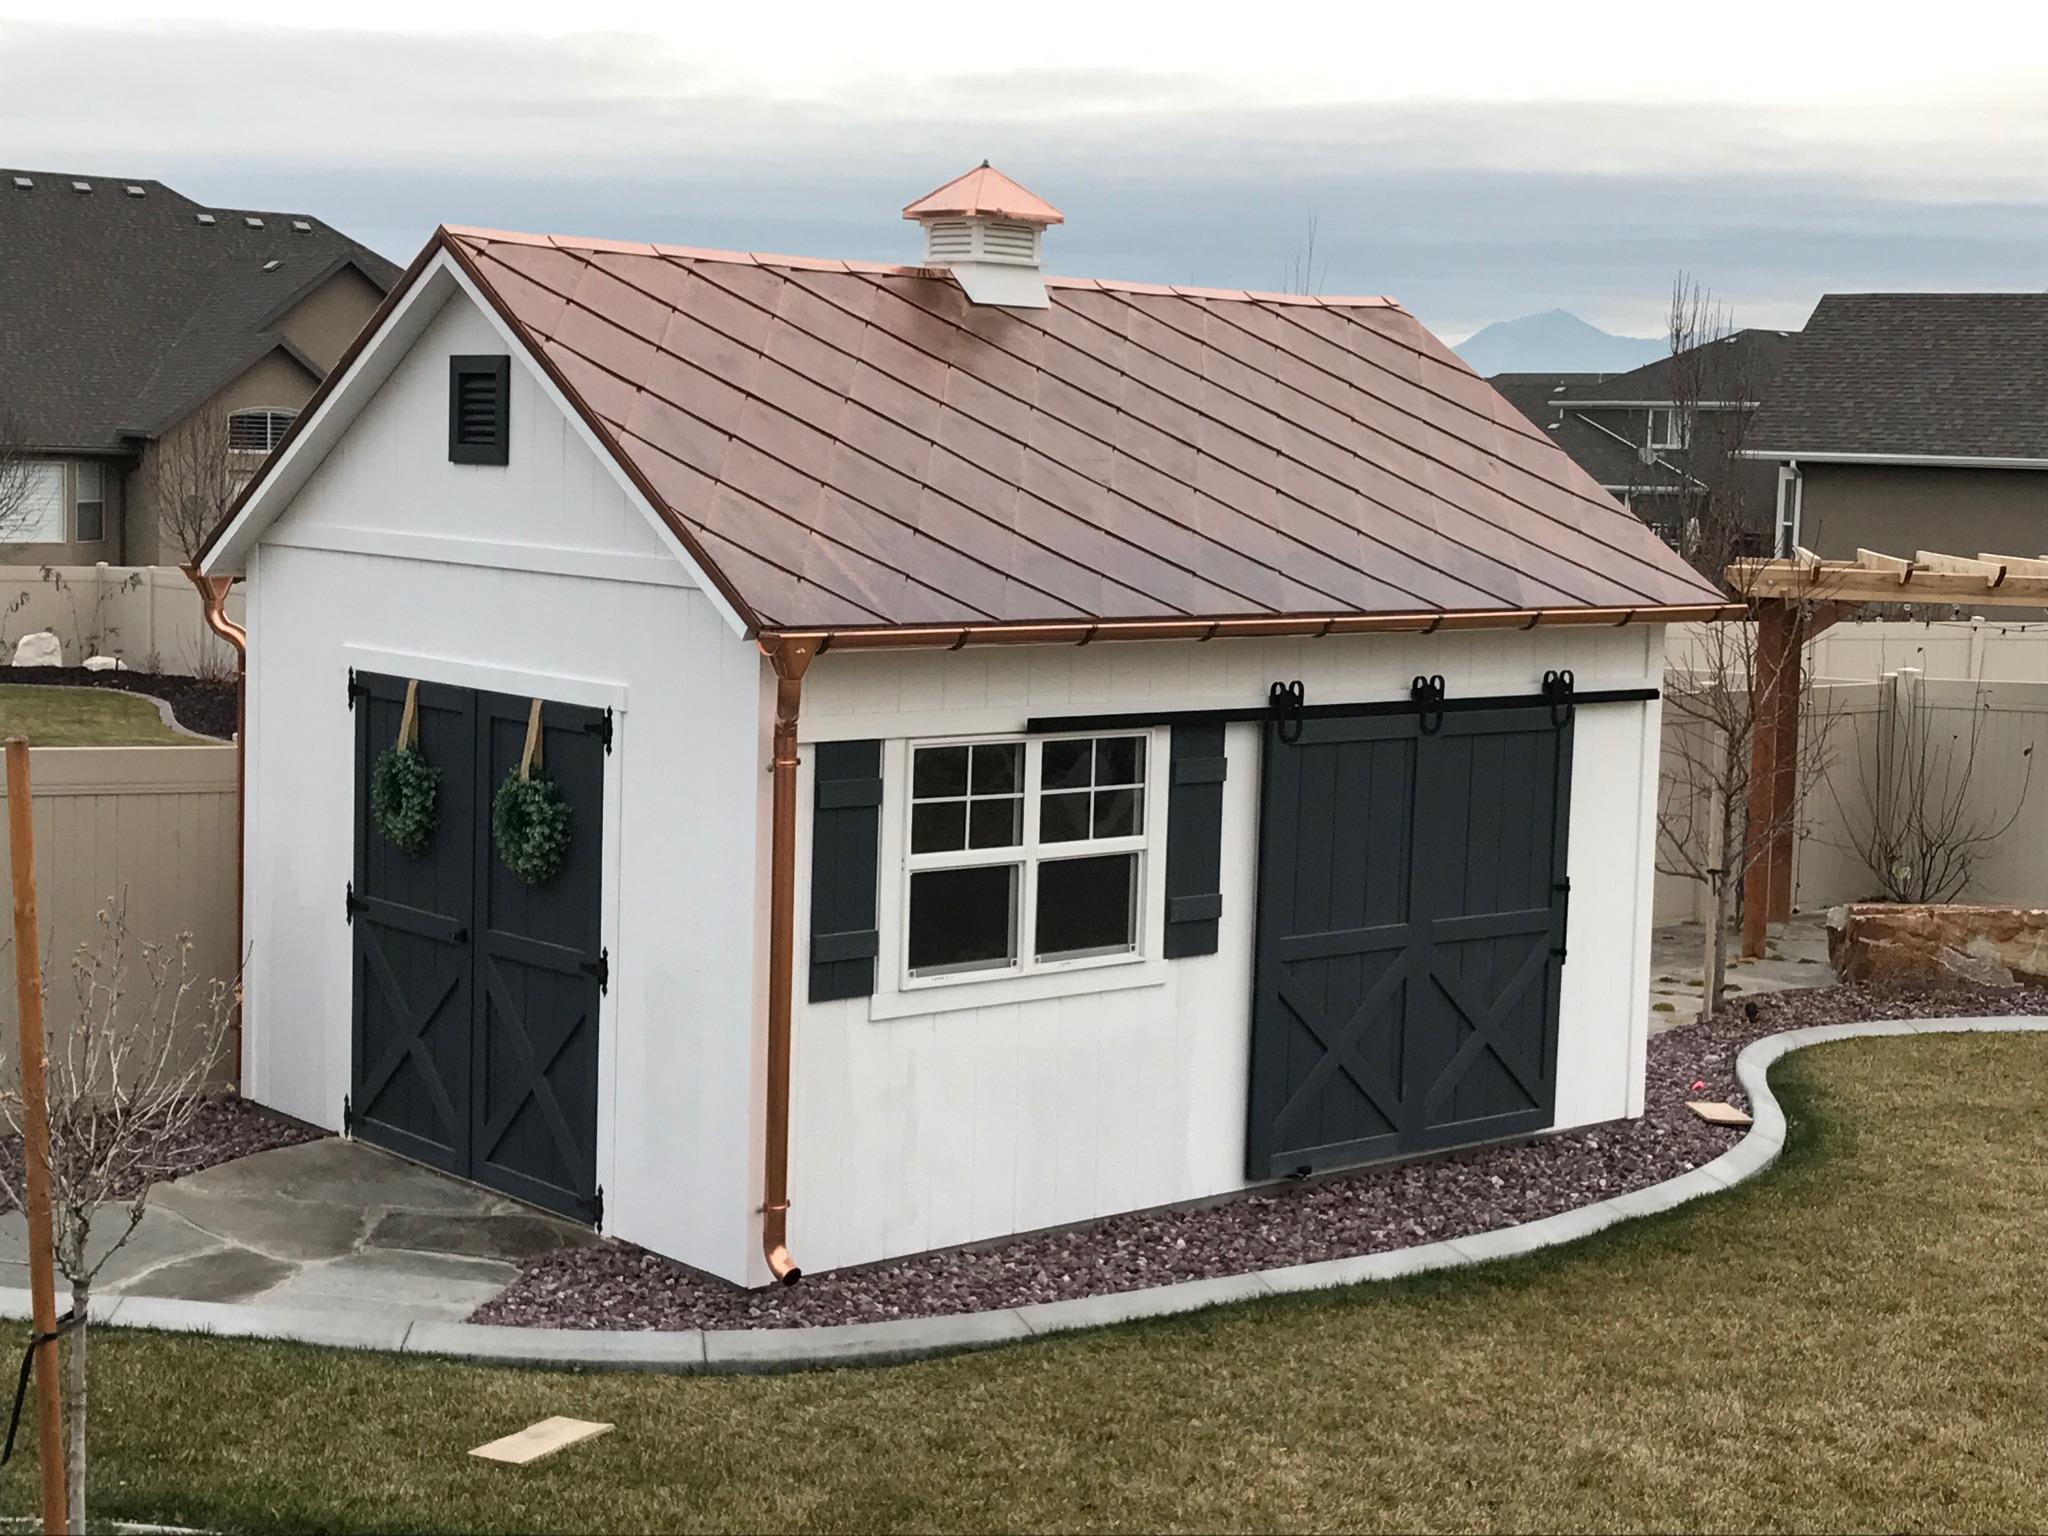 European Half Round Gutter Fine Metal Roof Tech